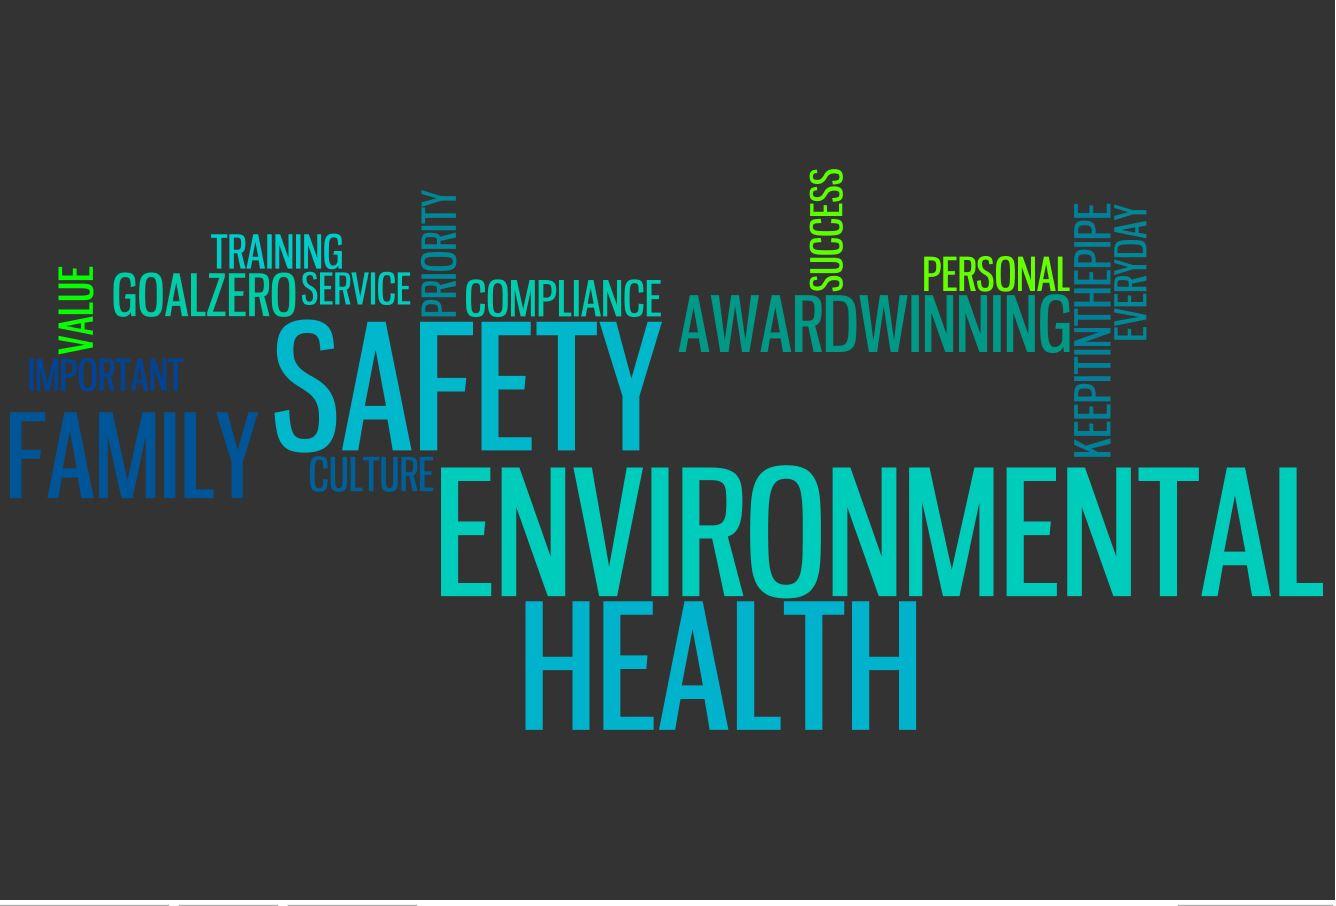 Safety Wordle6.JPG